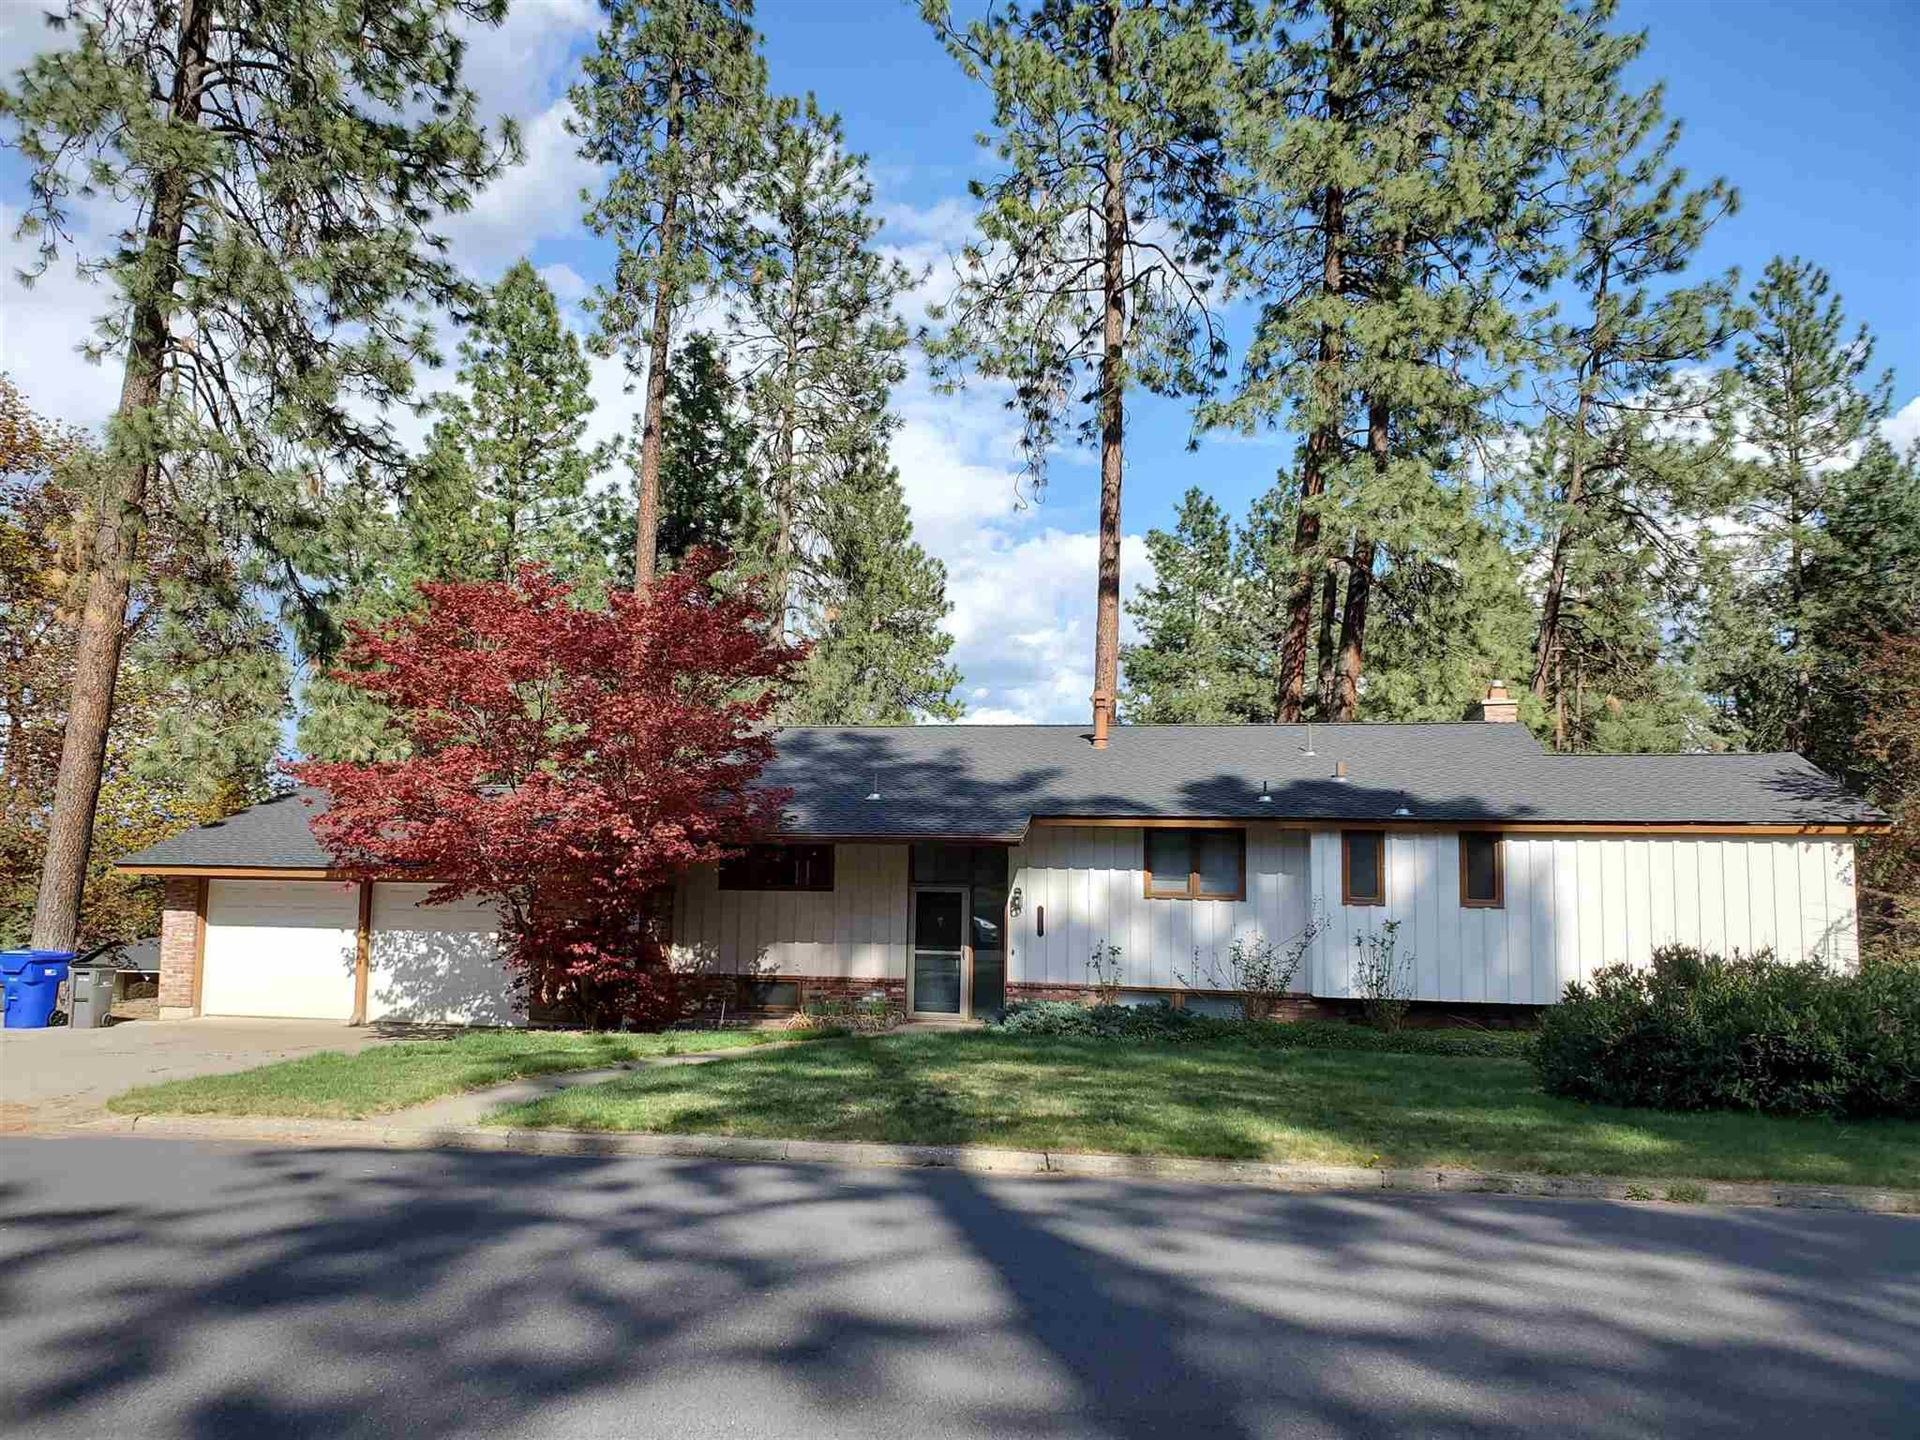 10122 N Huntington Rd, Spokane, WA 99218-2405 - #: 202114917